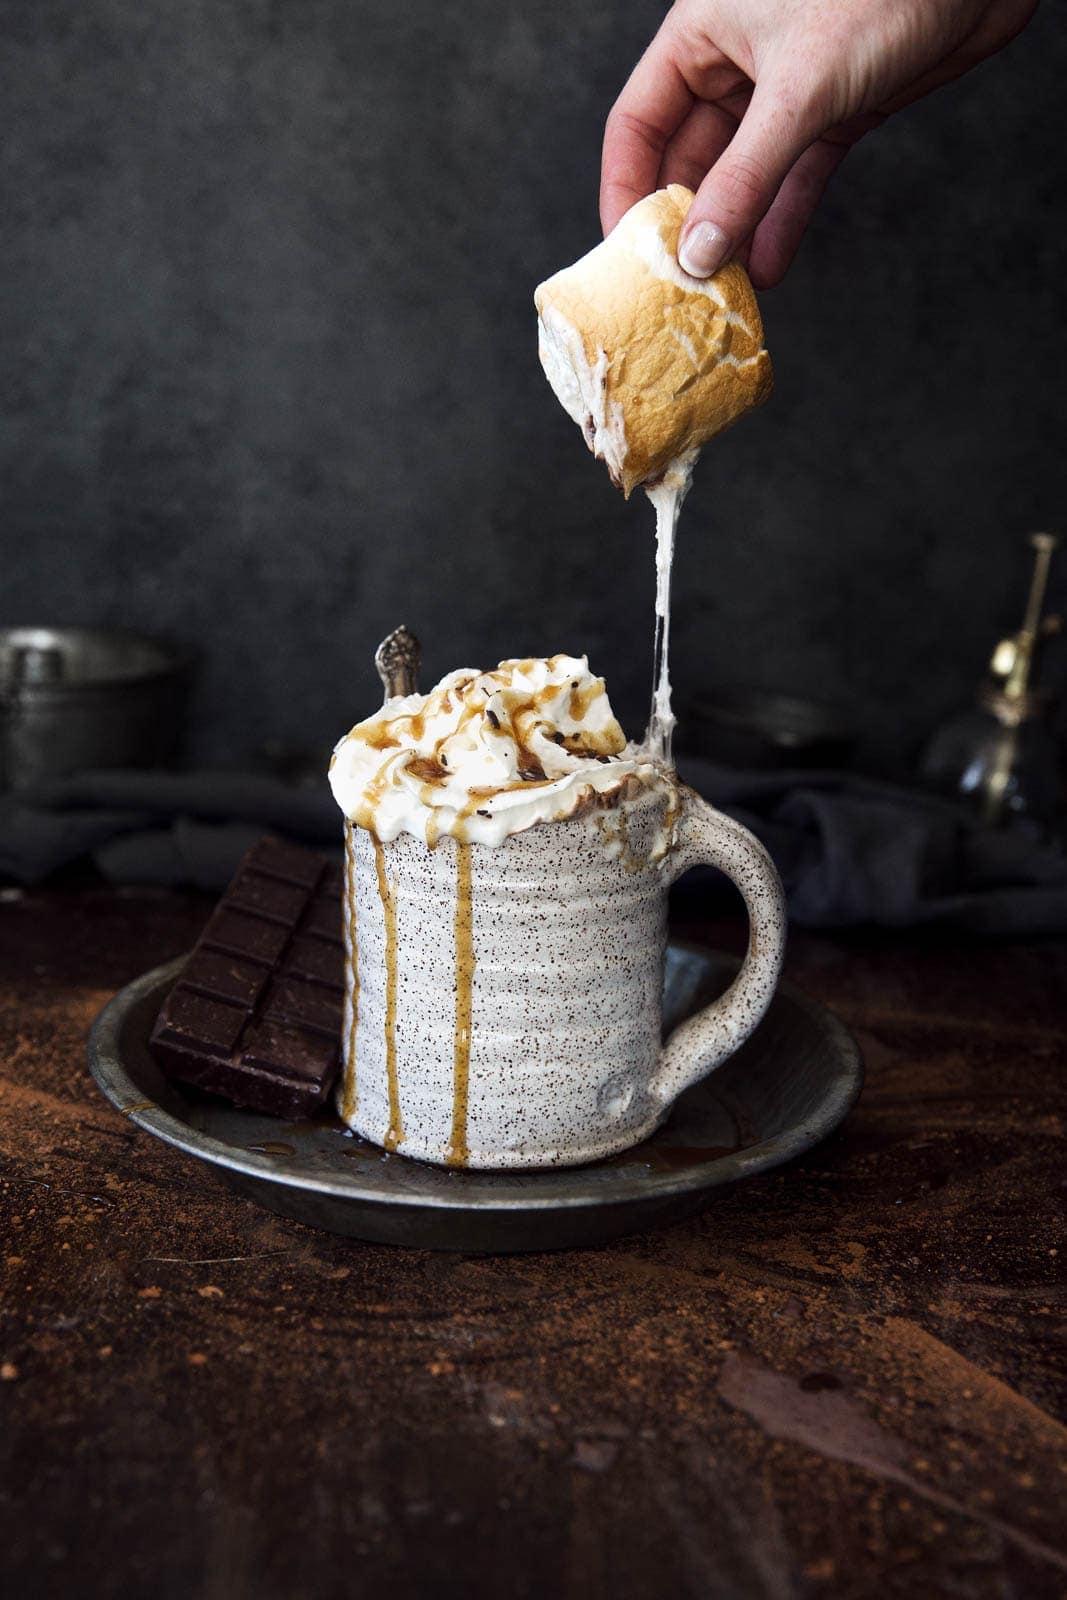 pulling a marshmallow off a caramel mocha